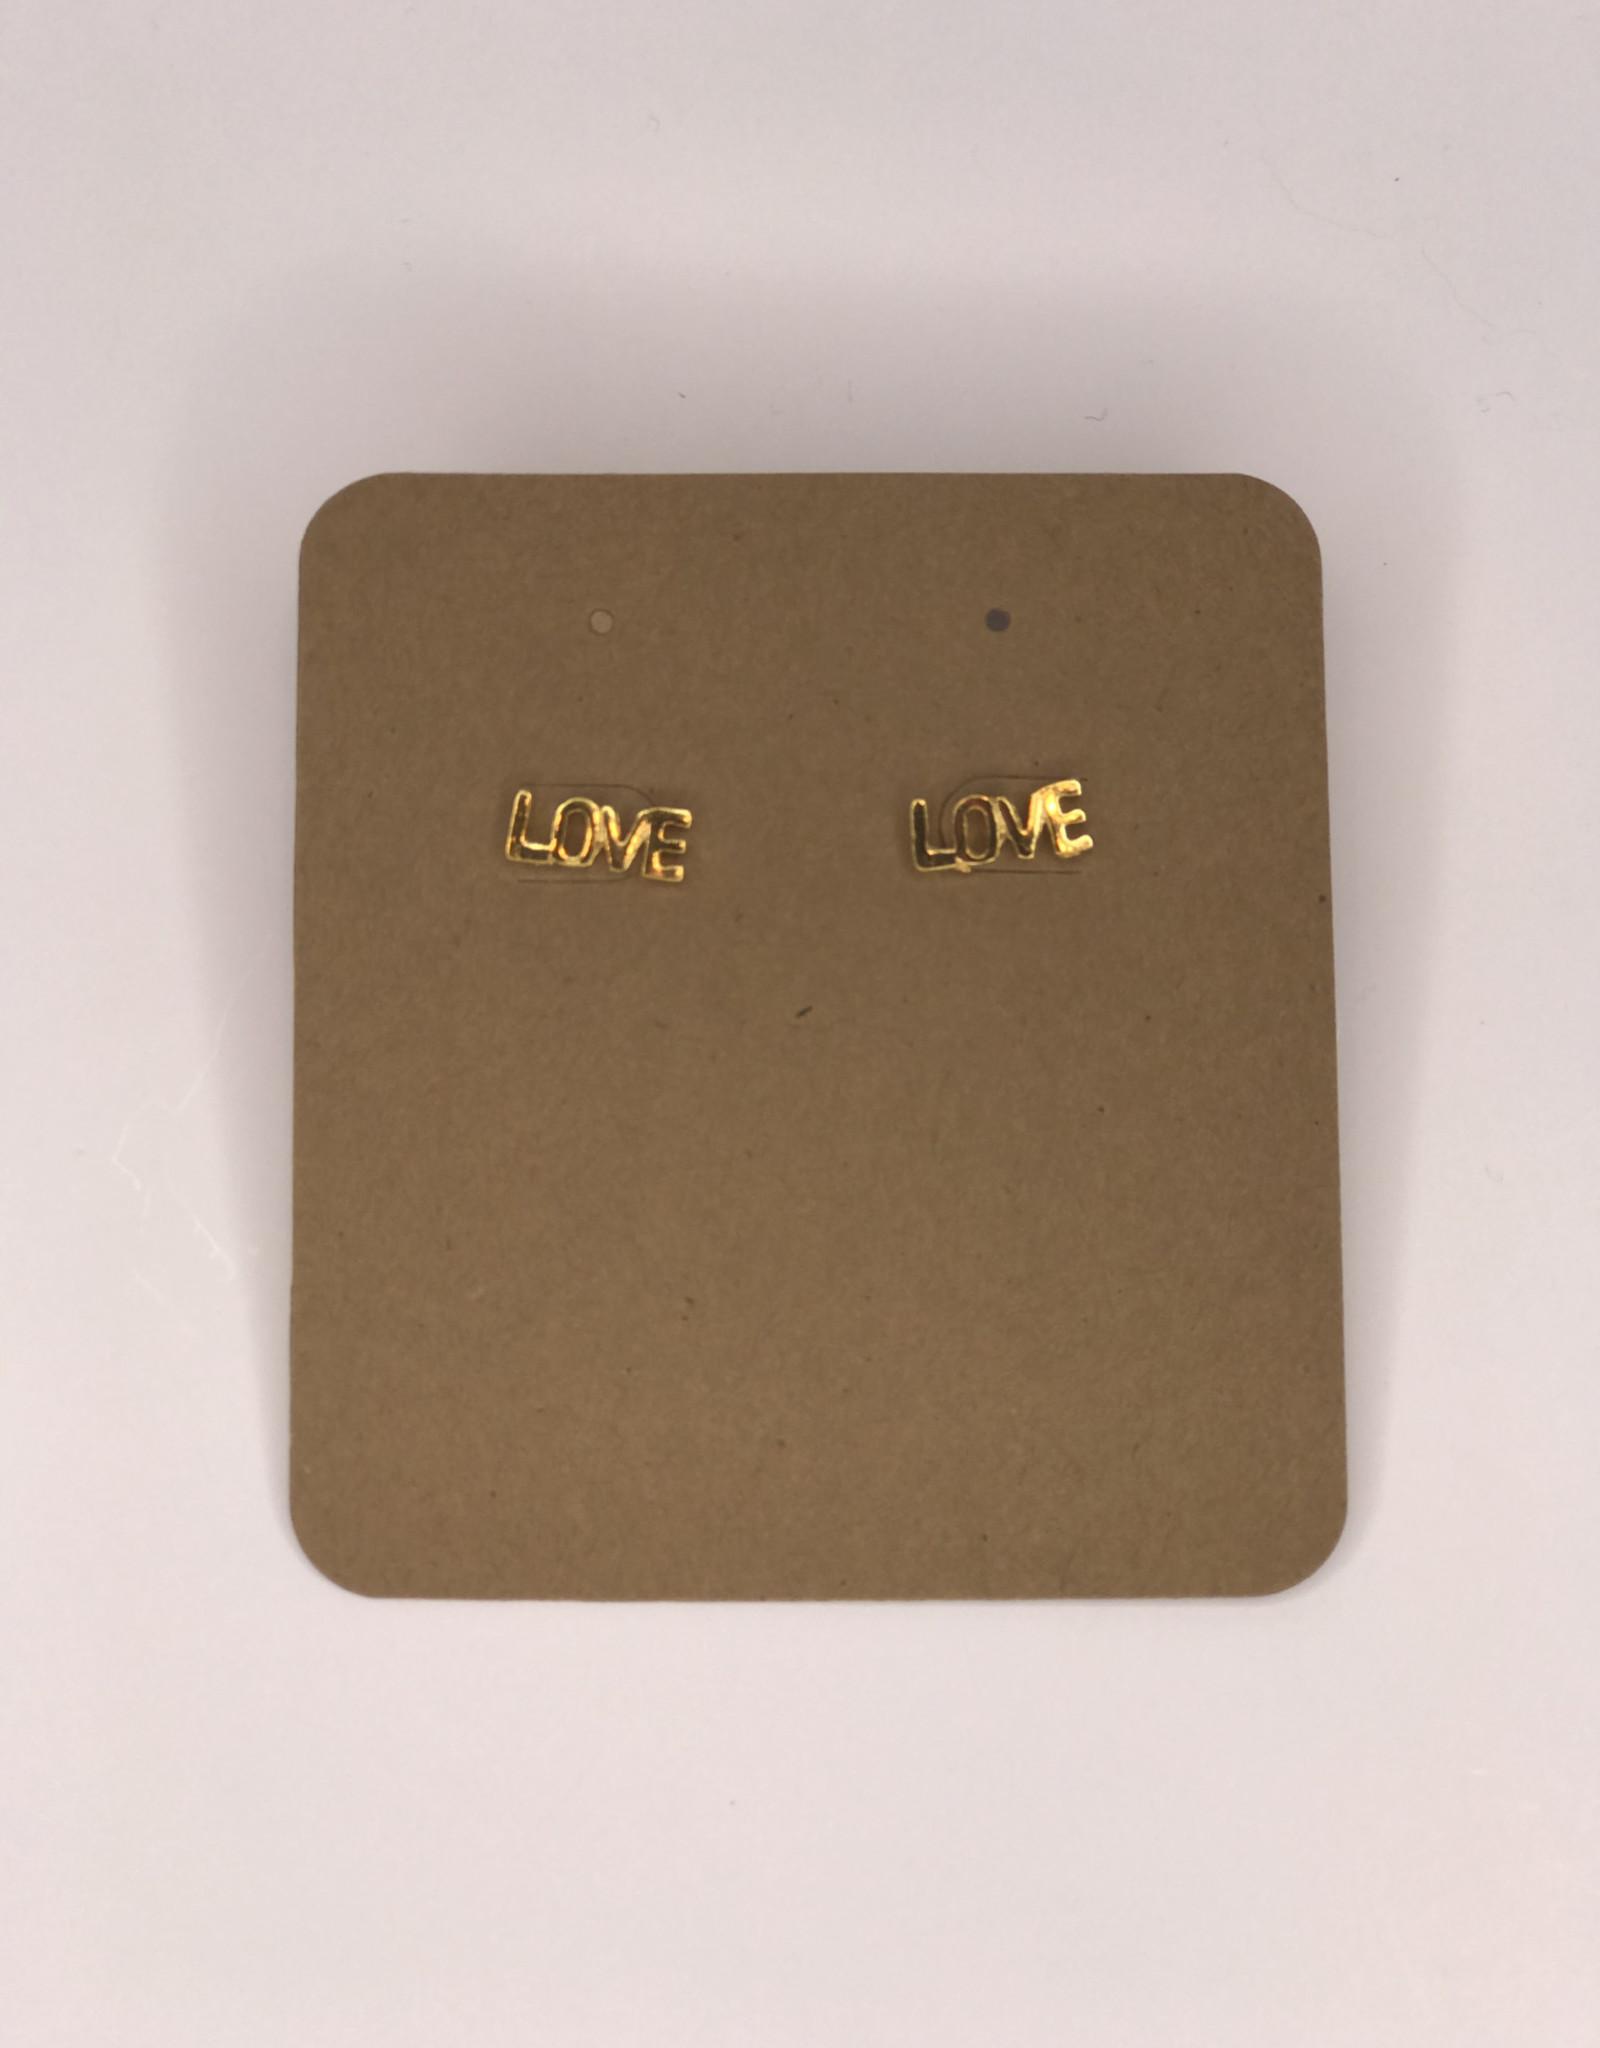 Amano Studios Earrings - Love Studs